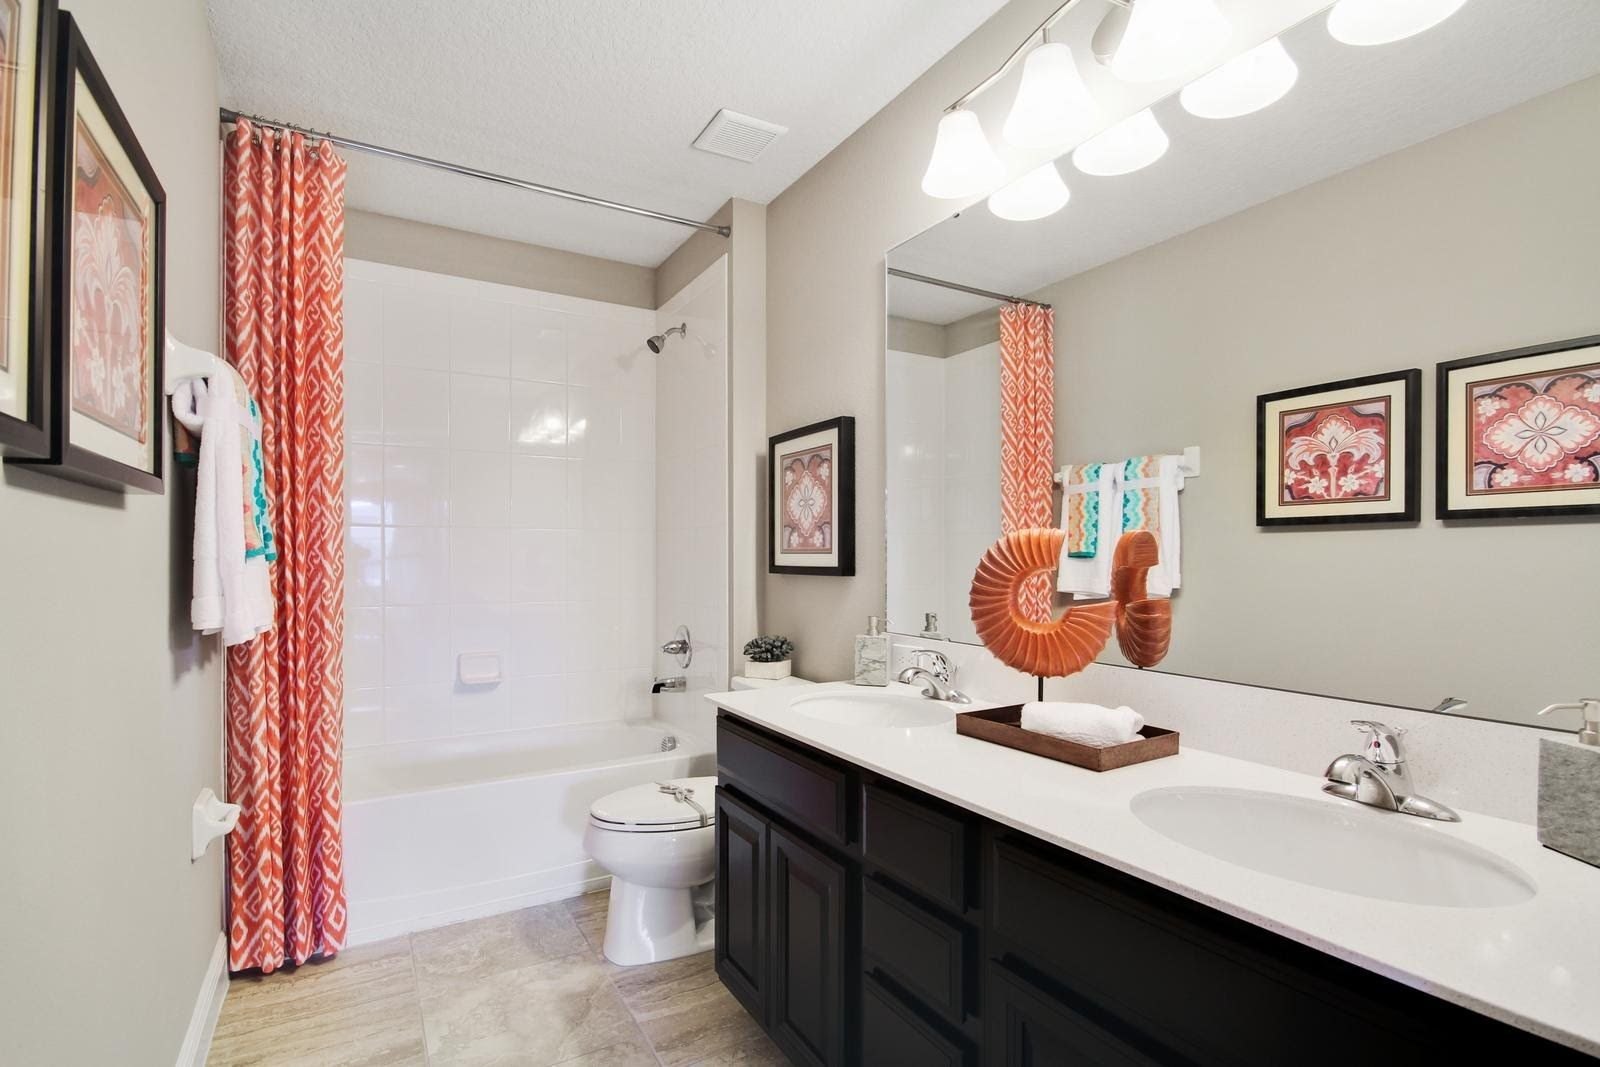 Bathroom featured in the Santa Rosa By Ryan Homes in Tampa-St. Petersburg, FL